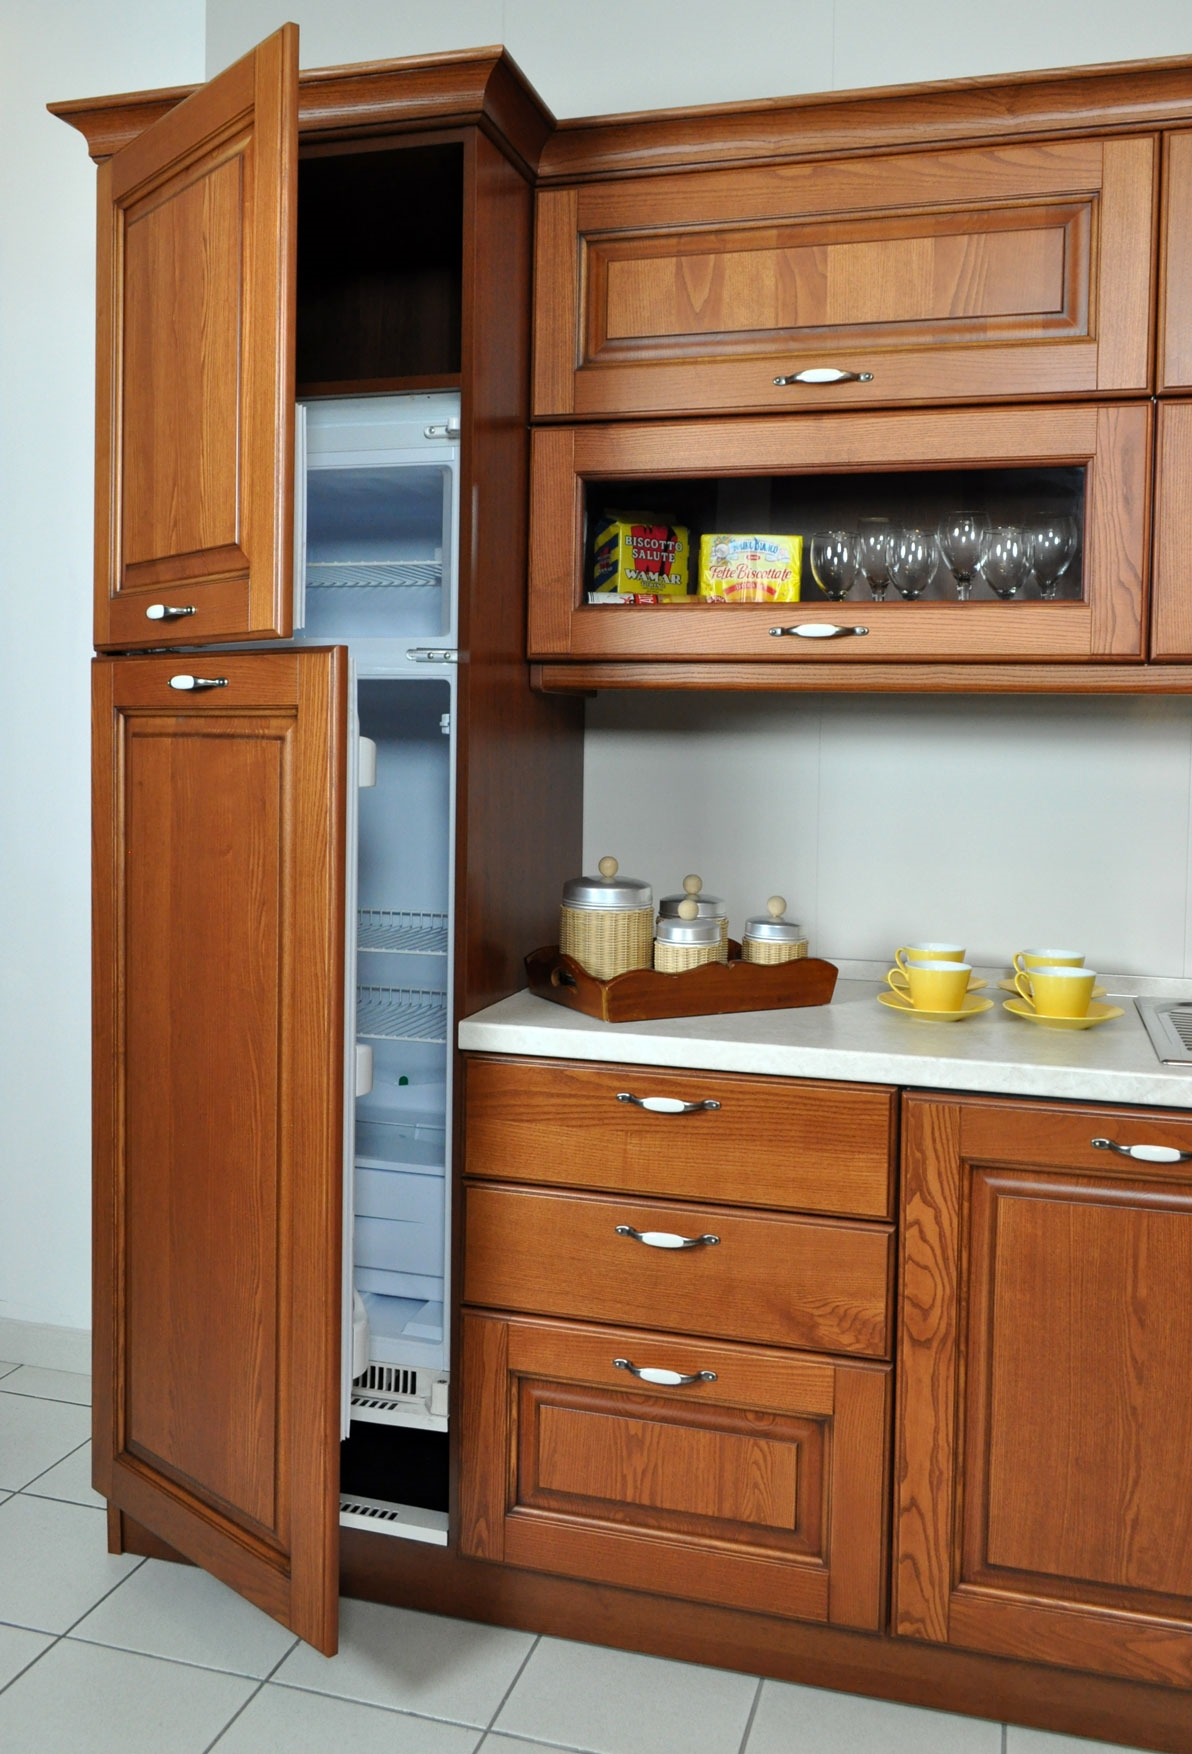 Cucina angolare veneta cucine con elettrodomestici - Elettrodomestici cucina ...